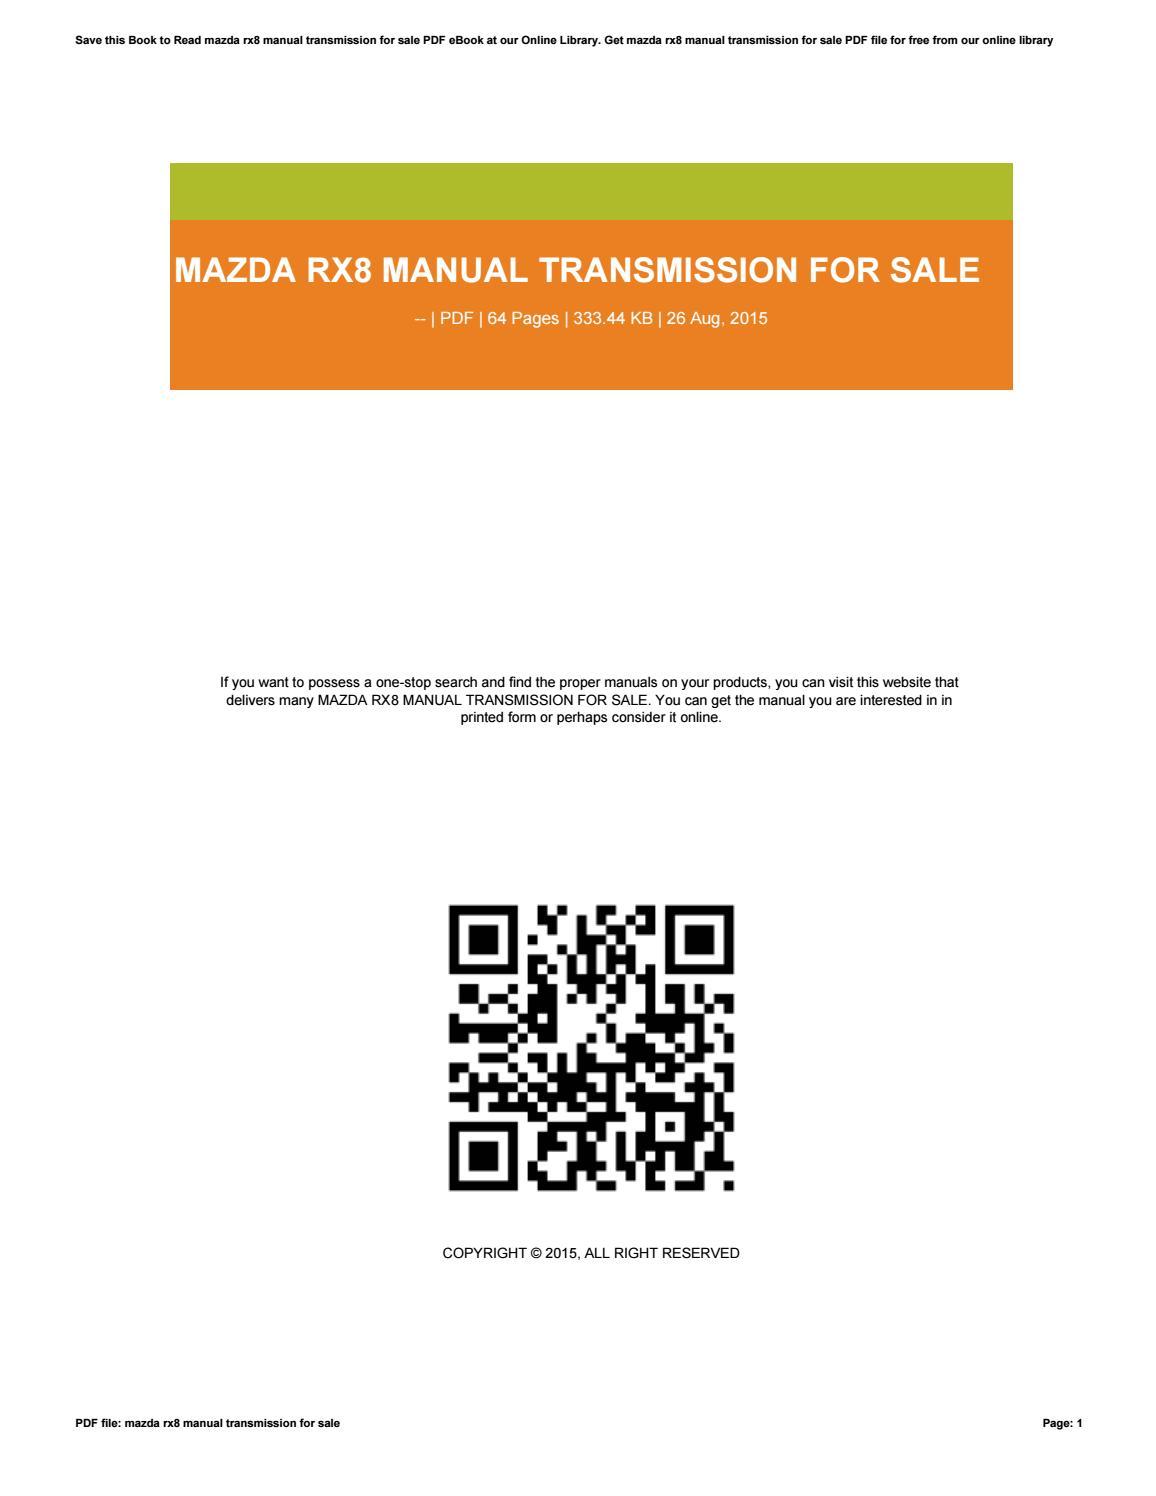 rx 8 manual pdf